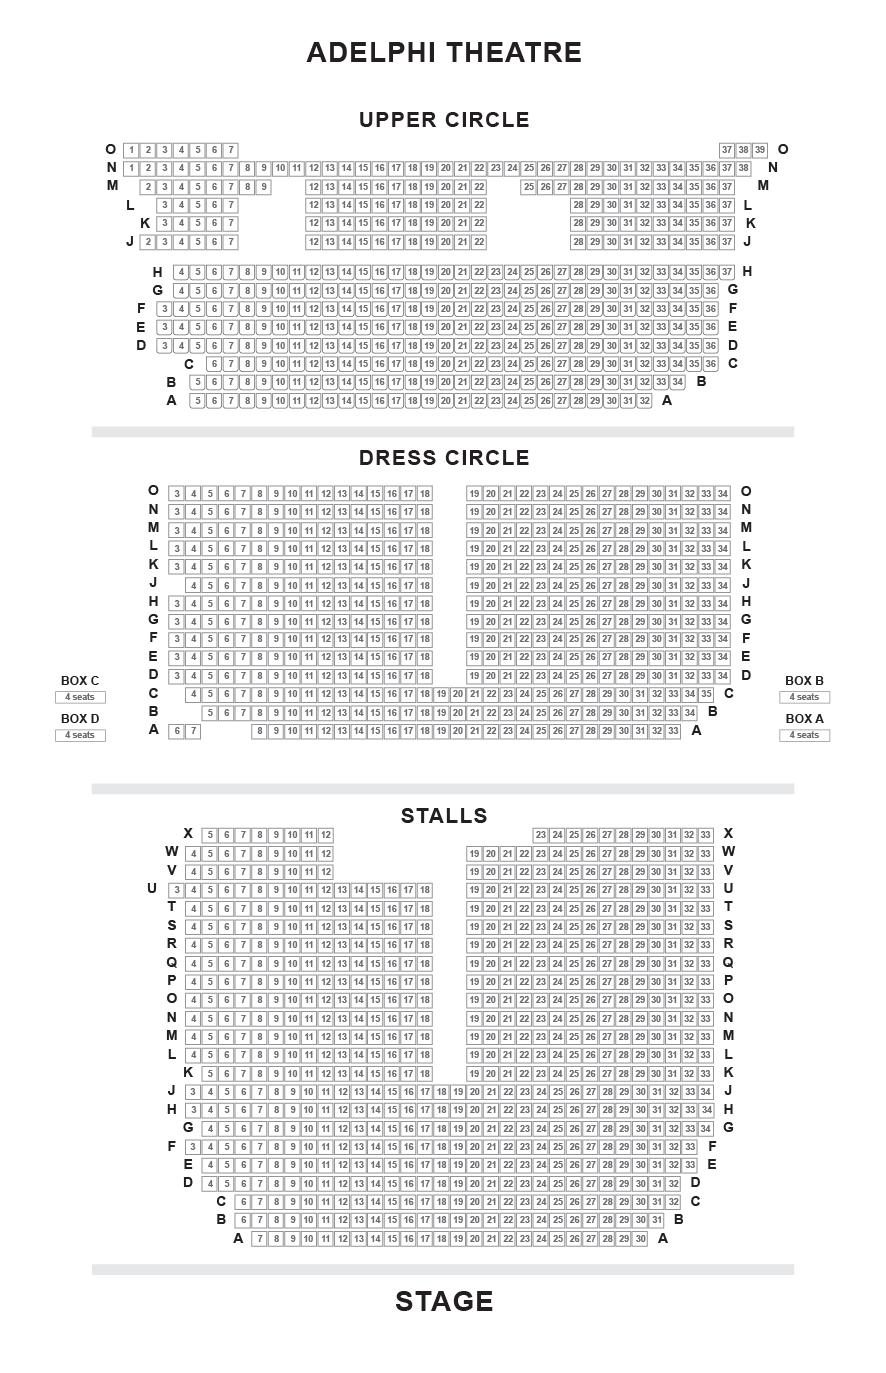 DO NOT USE Seating Plan